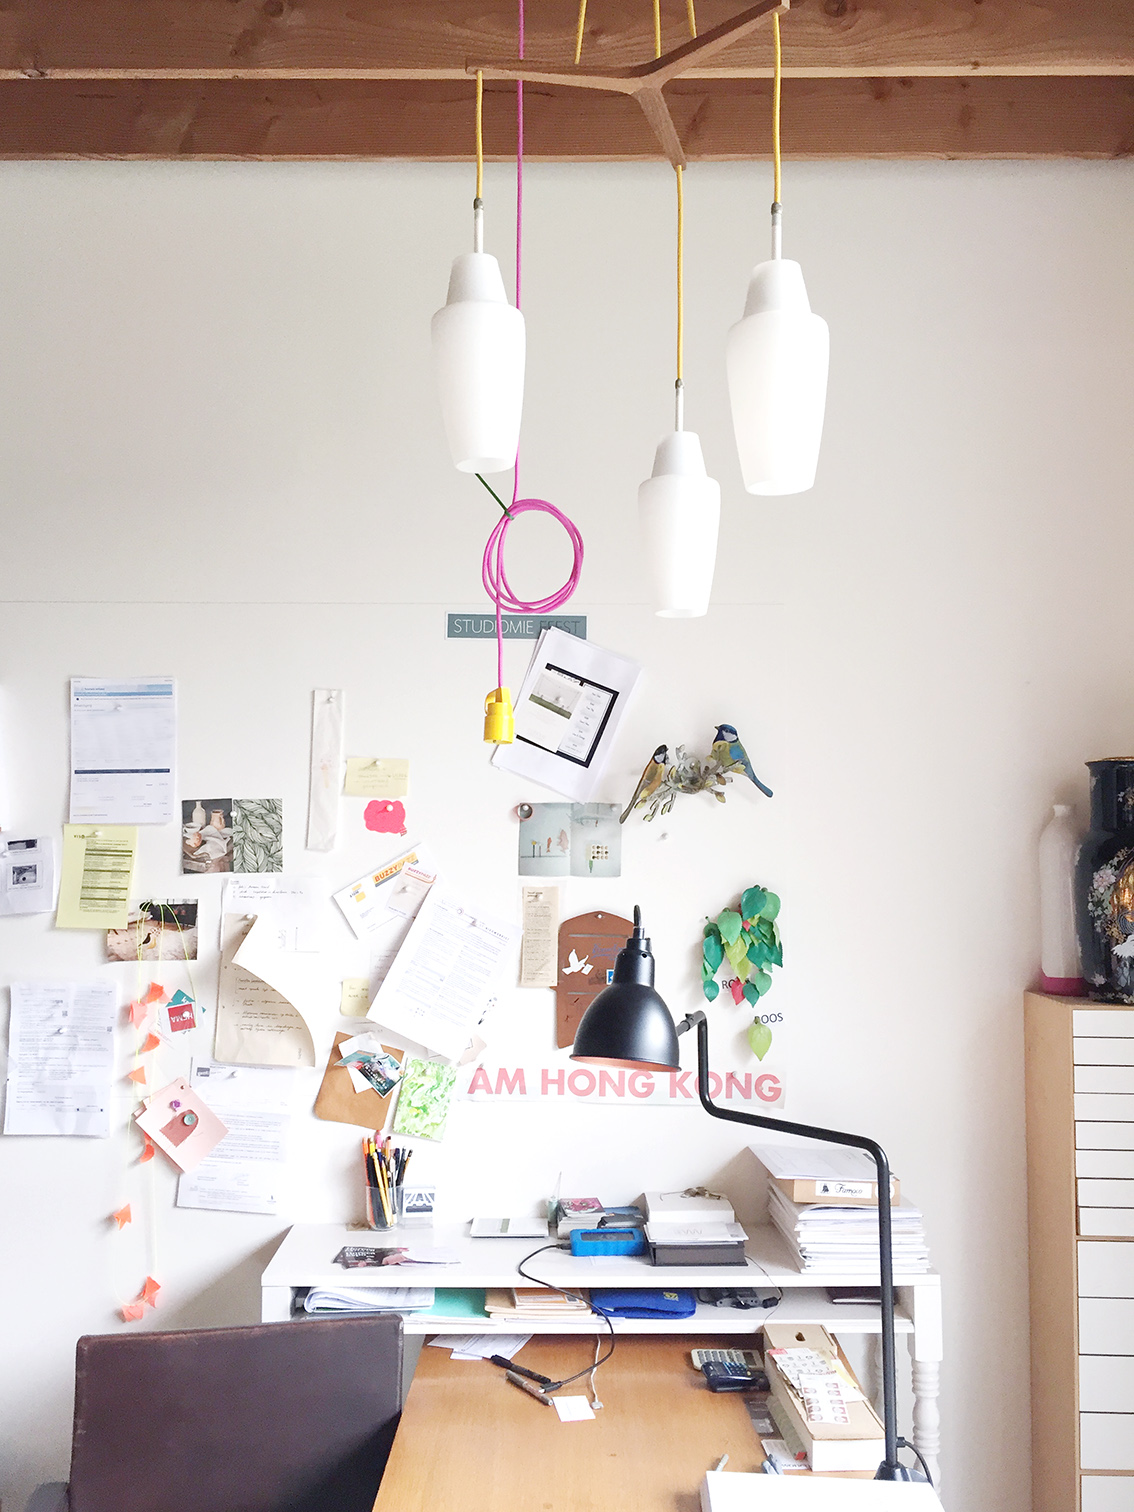 Mieke's studio